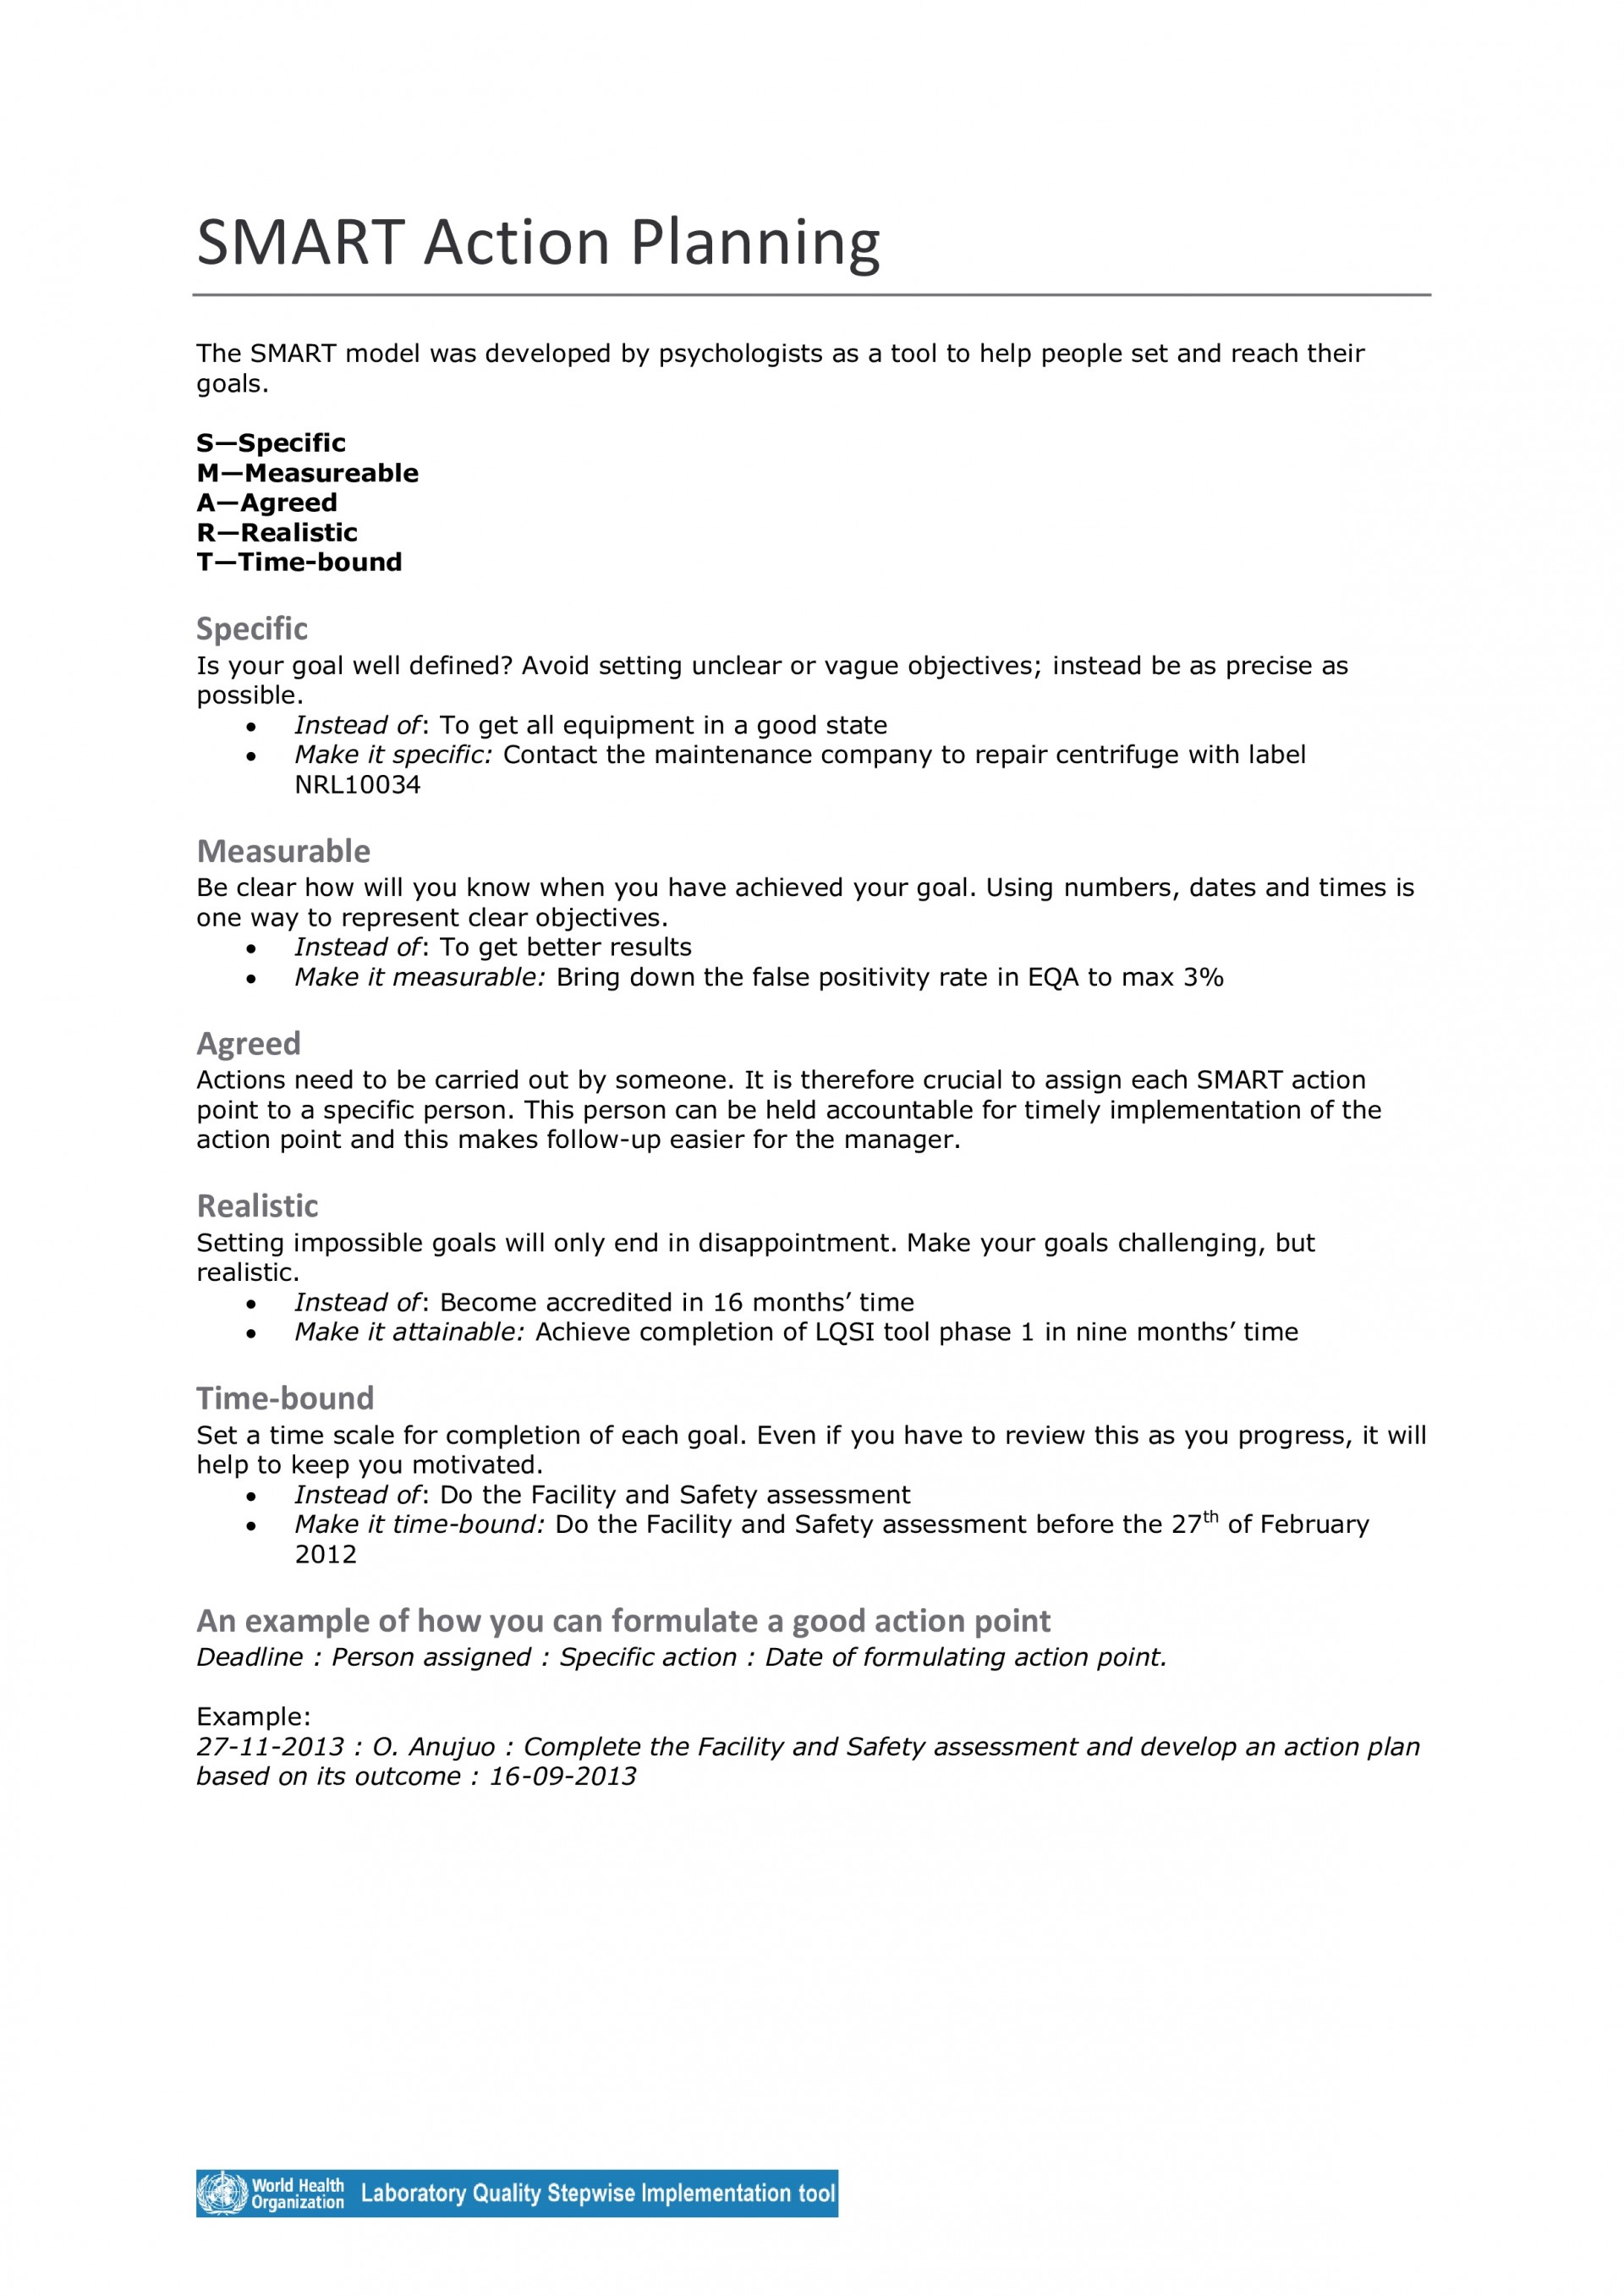 003 Sensational Smart Action Plan Template Example  Nursing For Busines Free1920